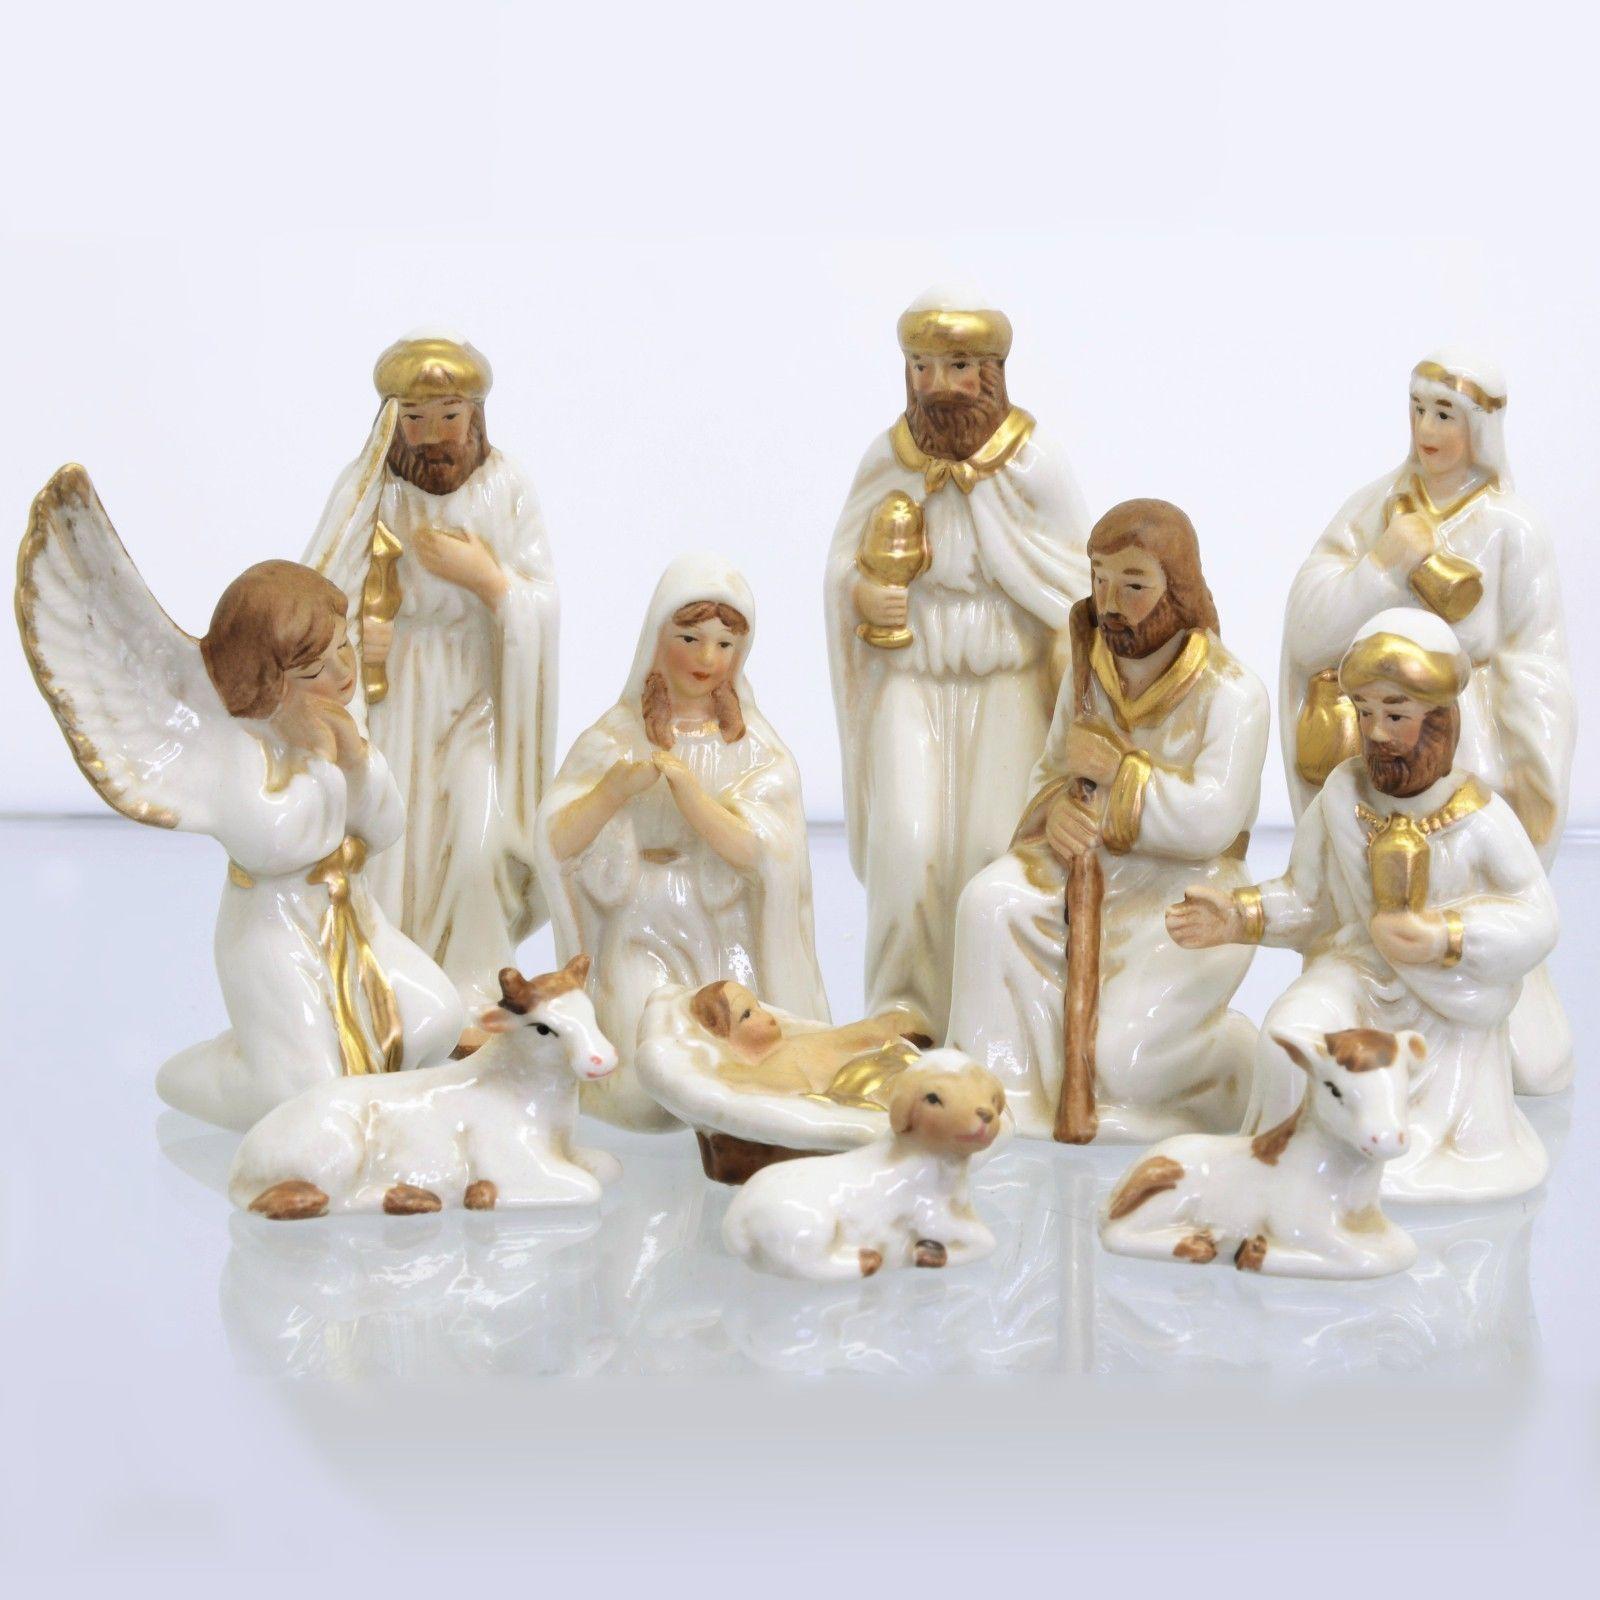 dcd69c9e6f4 Set 11 figuras decorativas cerámica Navidad nacimiento Belén blanco-dorado